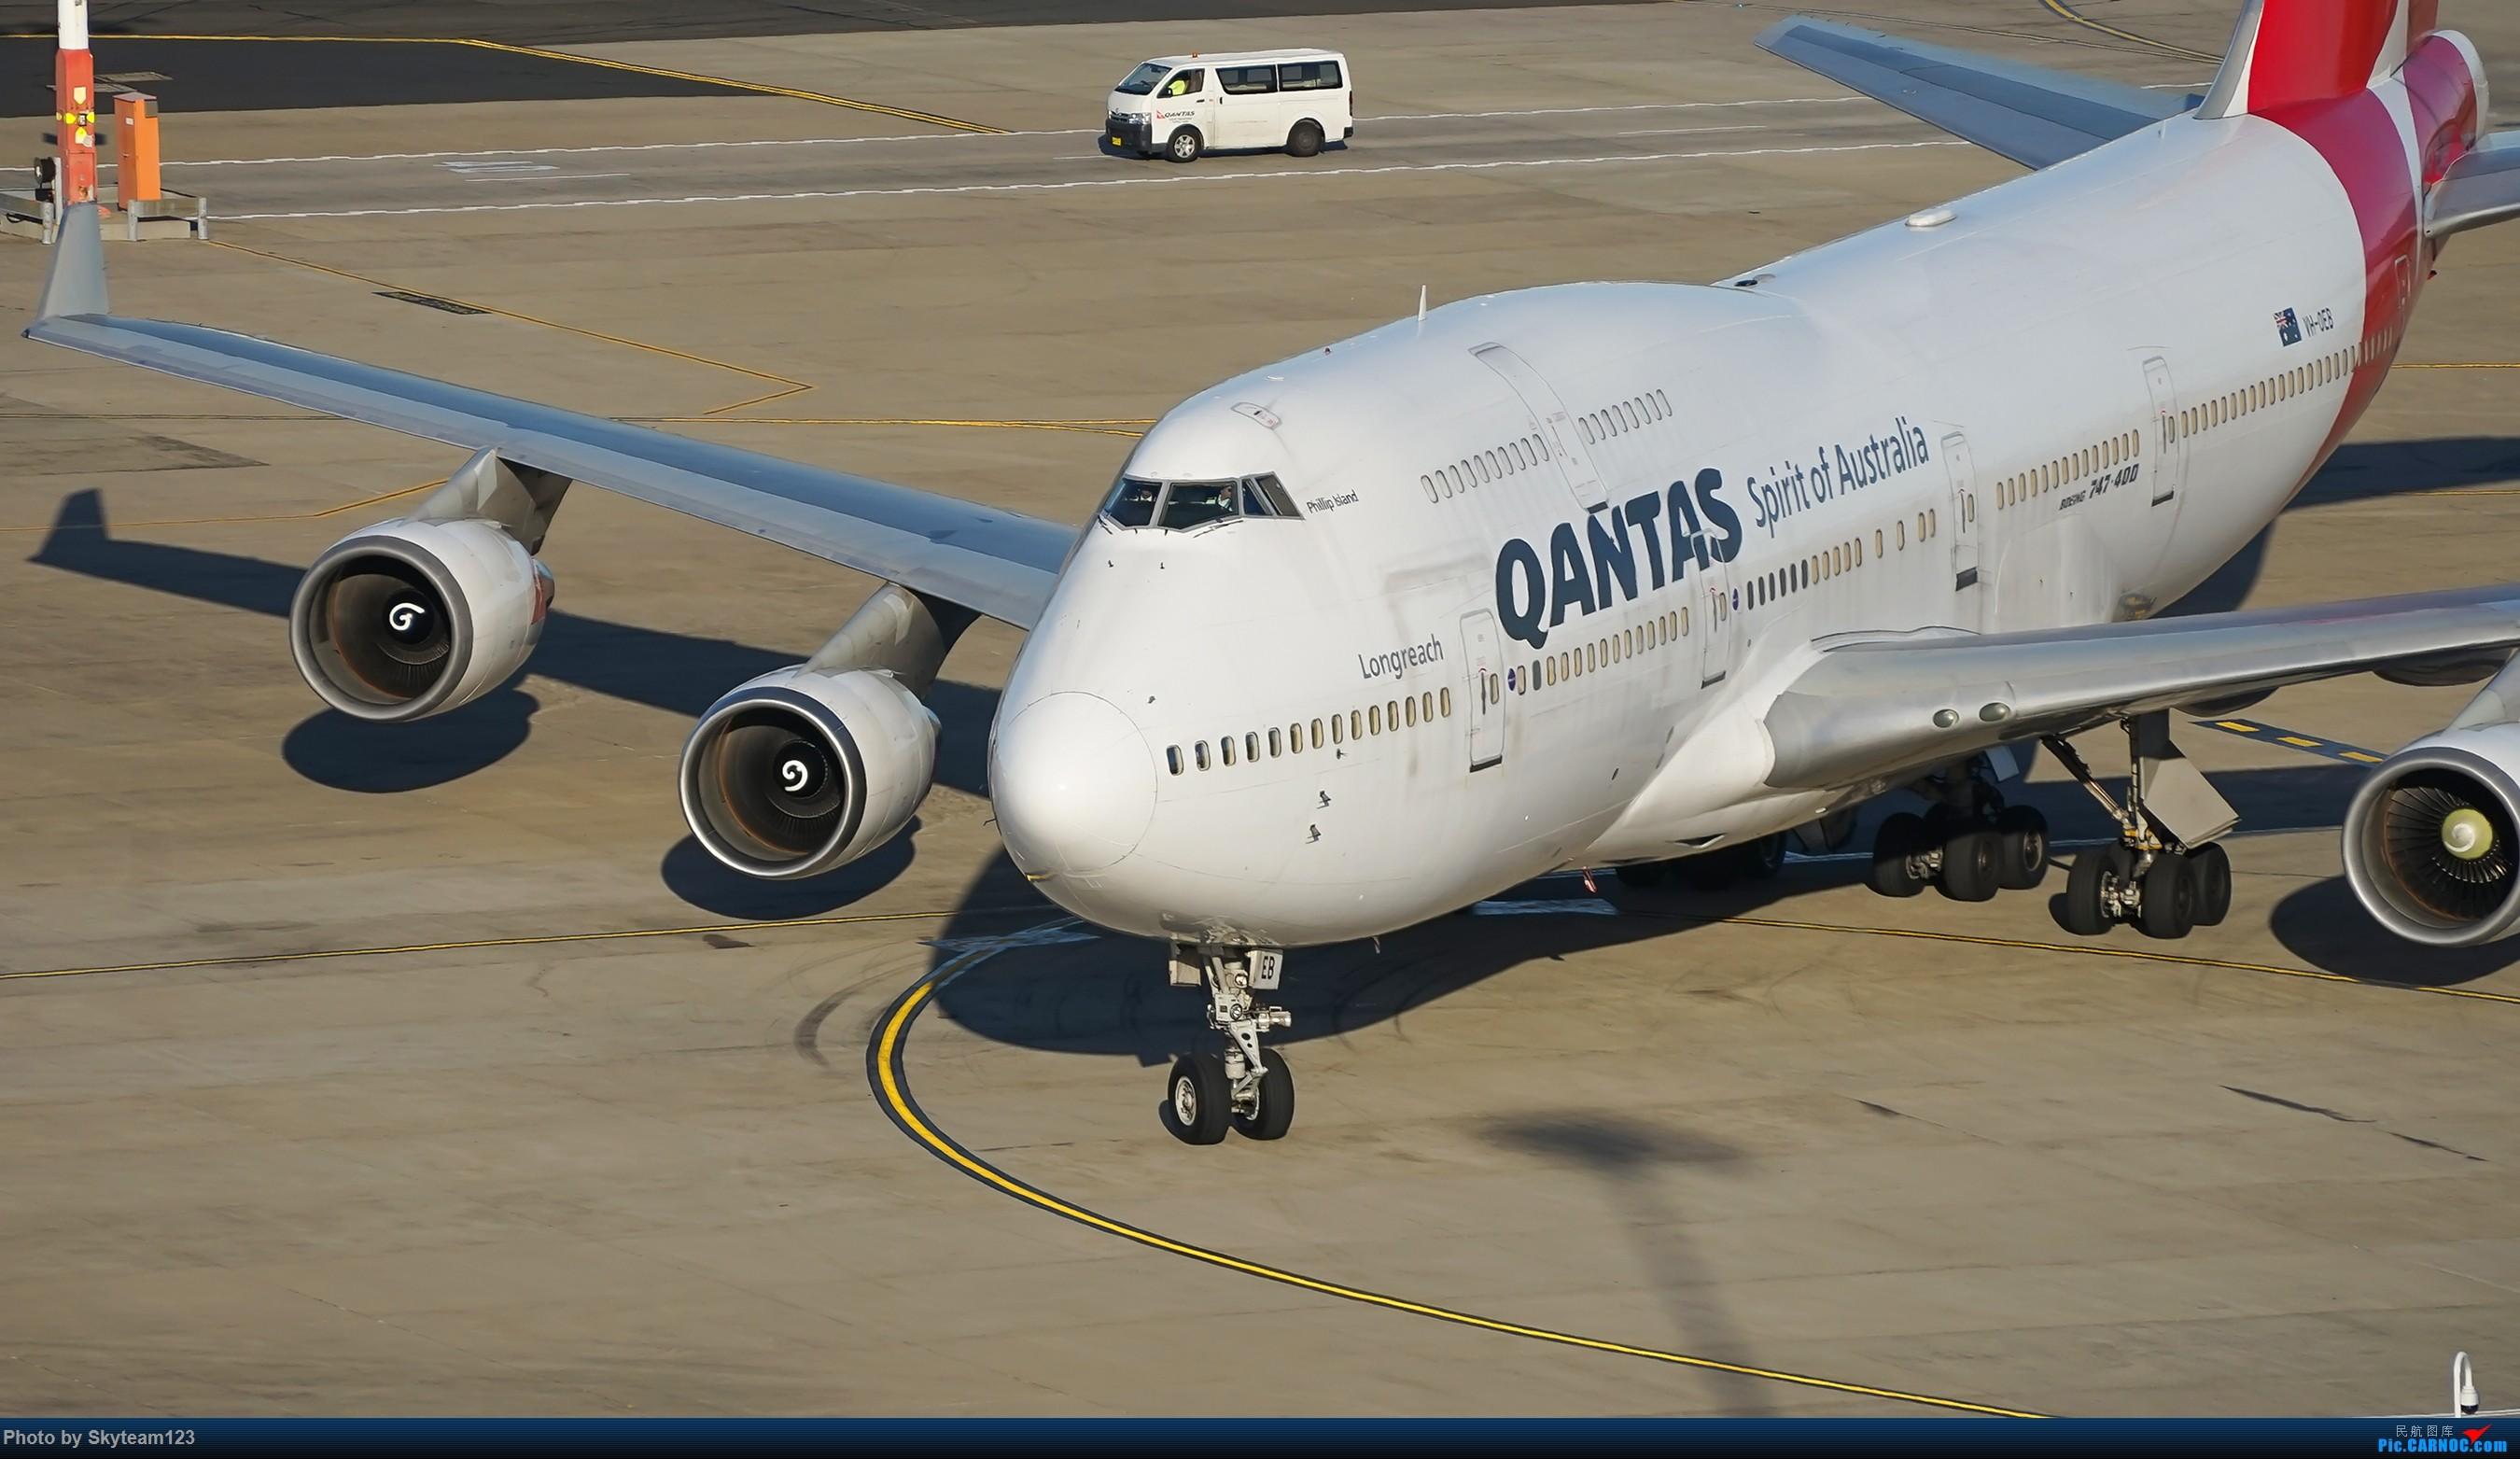 Re:[原创][SYD] 假期拍机小结 解锁16R跑道头拍机位 & 停车楼拍机作业 【全宽体】 BOEING 747-400 VH-OEB 澳大利亚悉尼金斯福德·史密斯机场